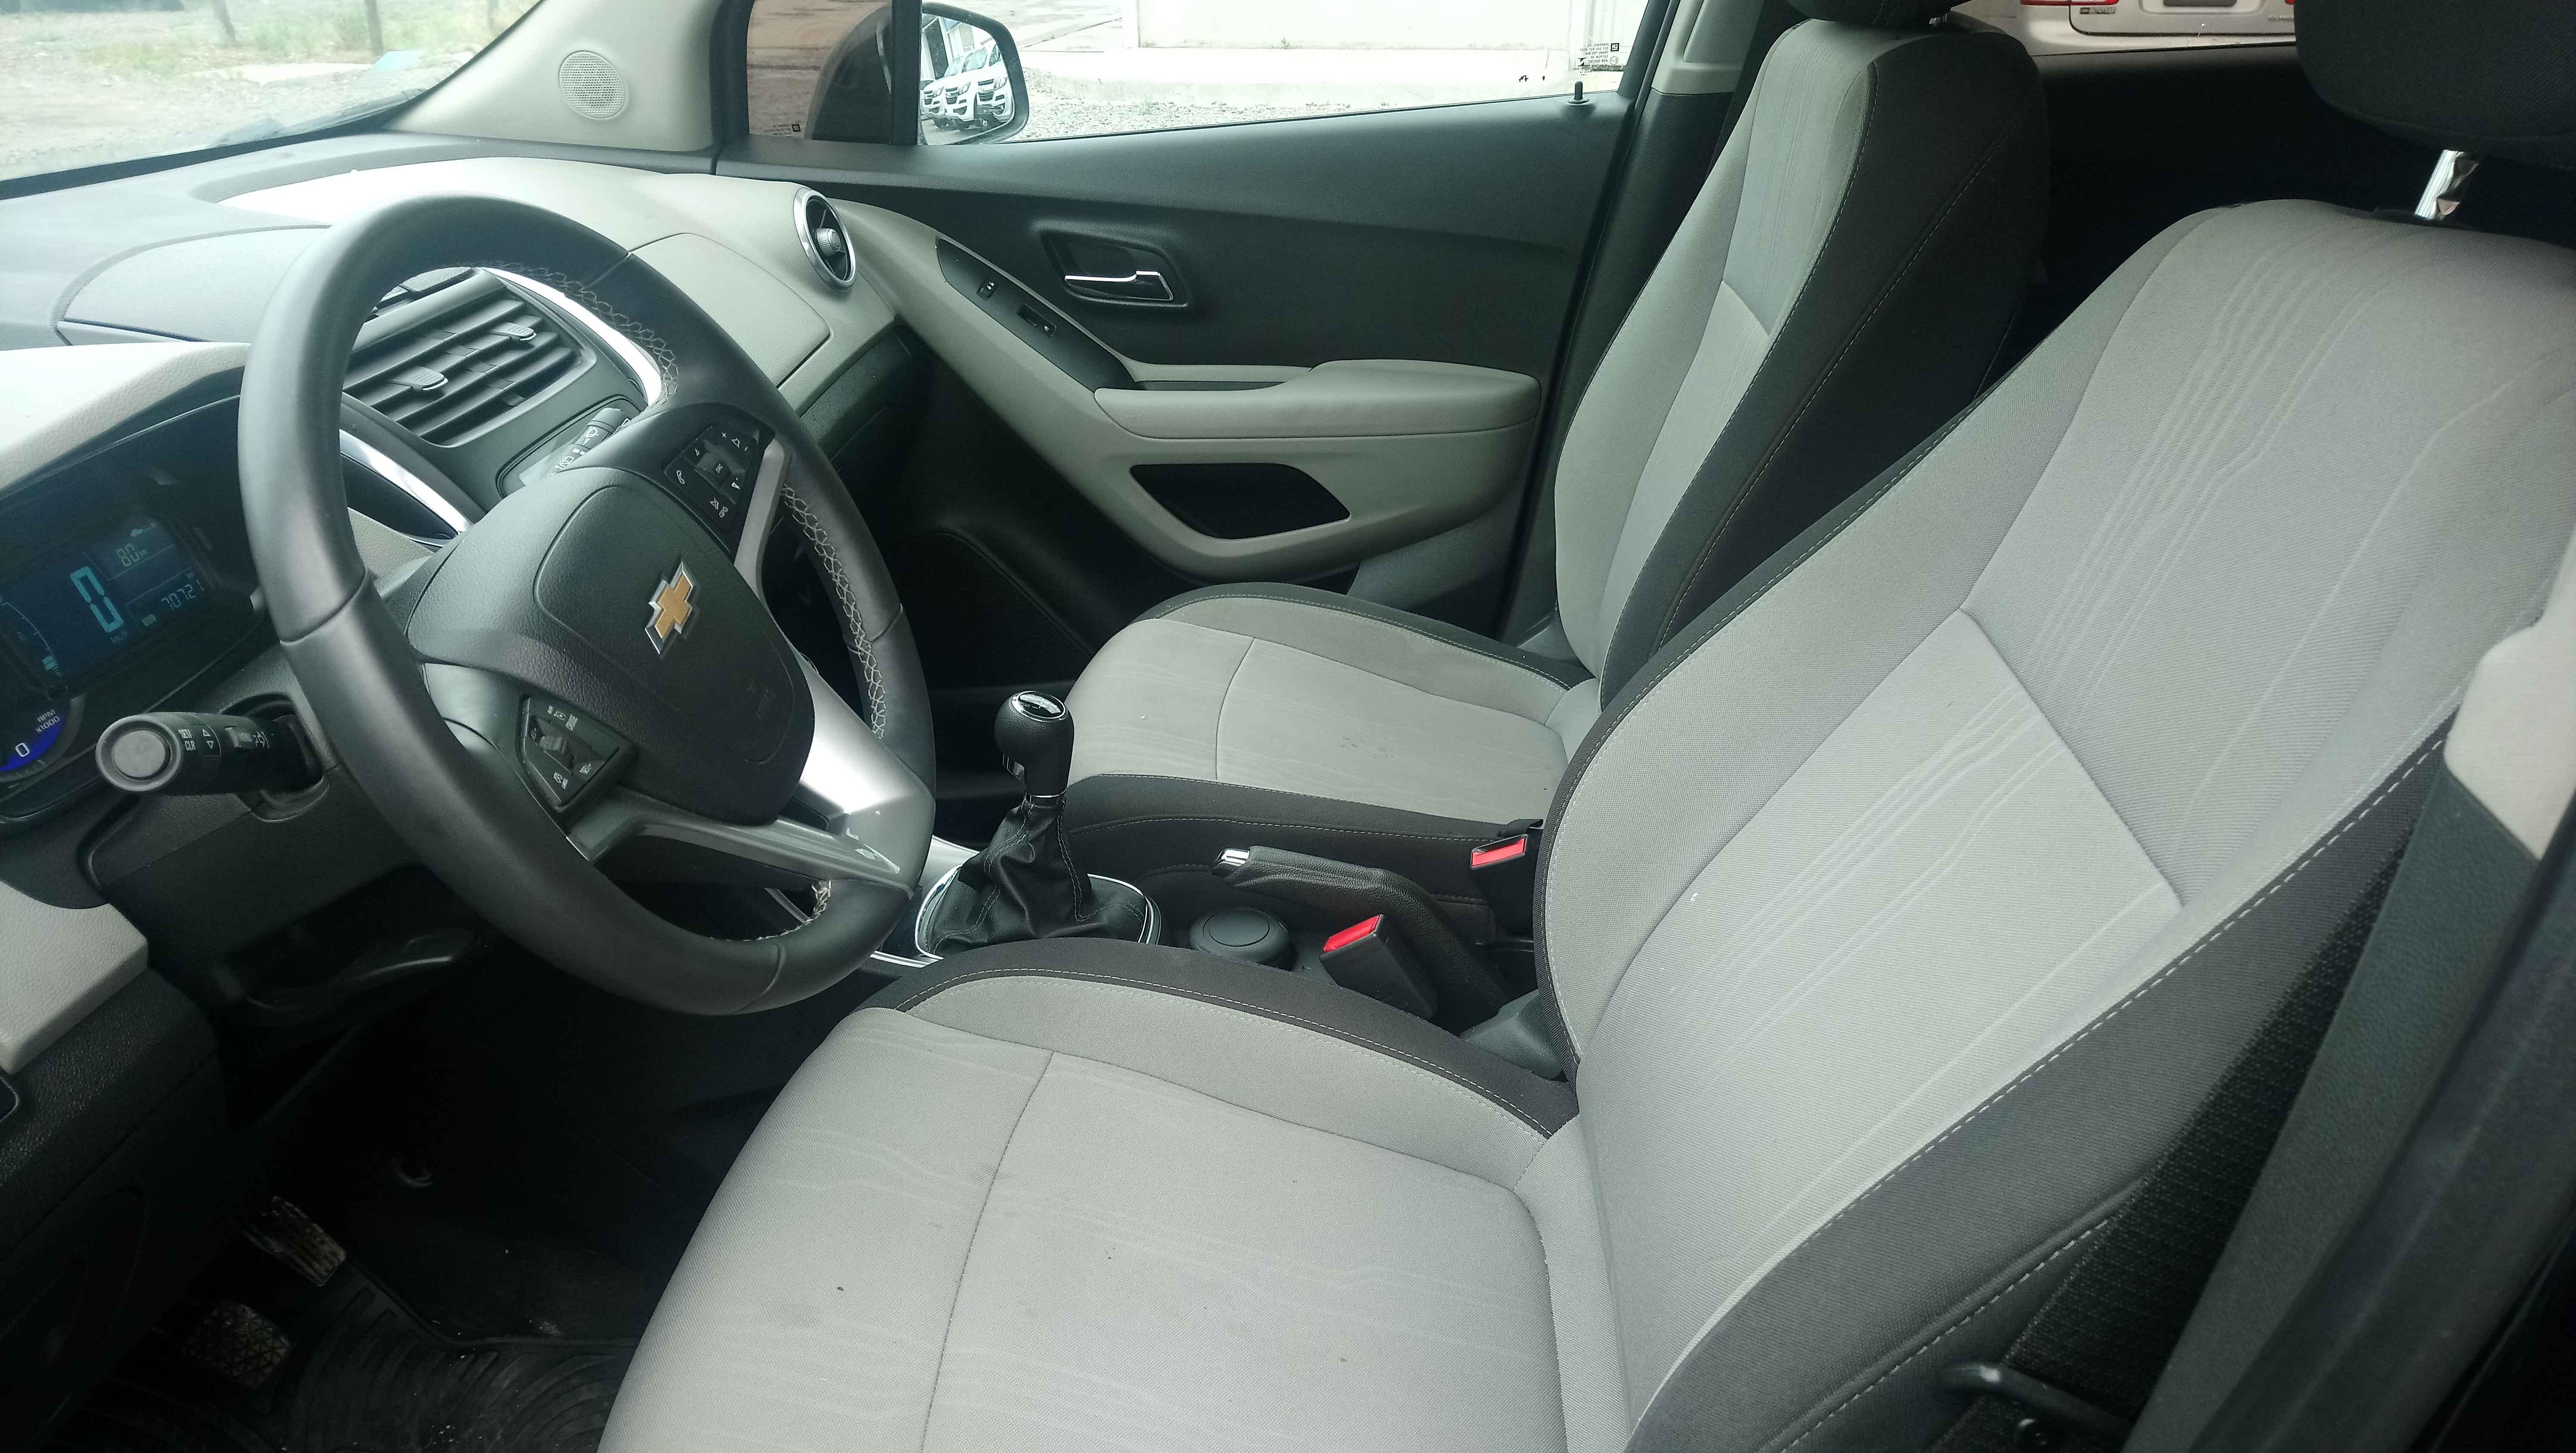 2014 Chevrolet Tracker LTZ 1.8L